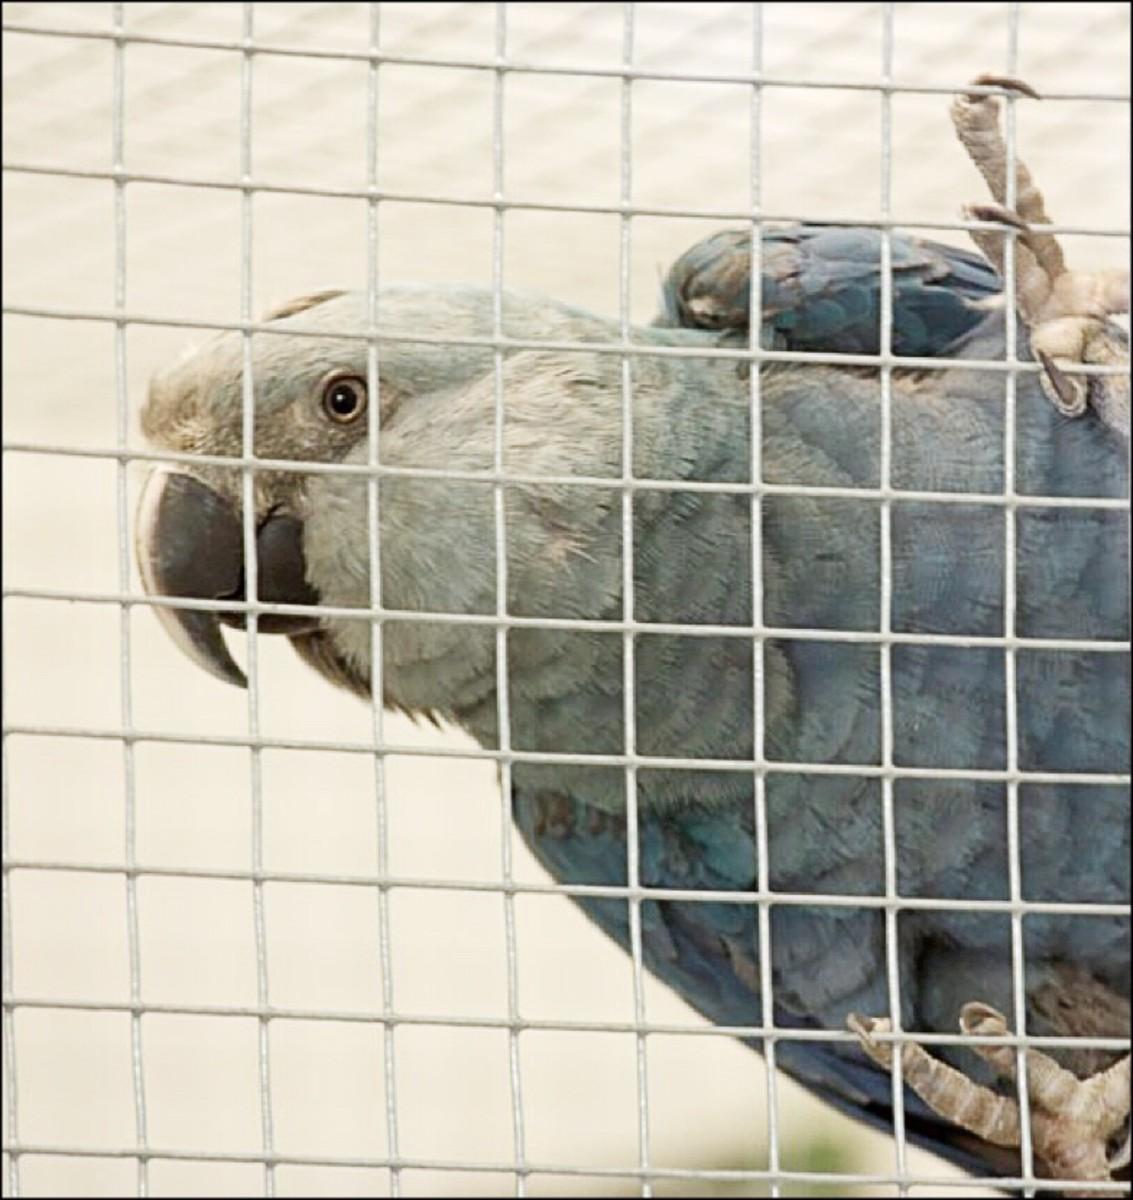 A juvenile Spix's macaw